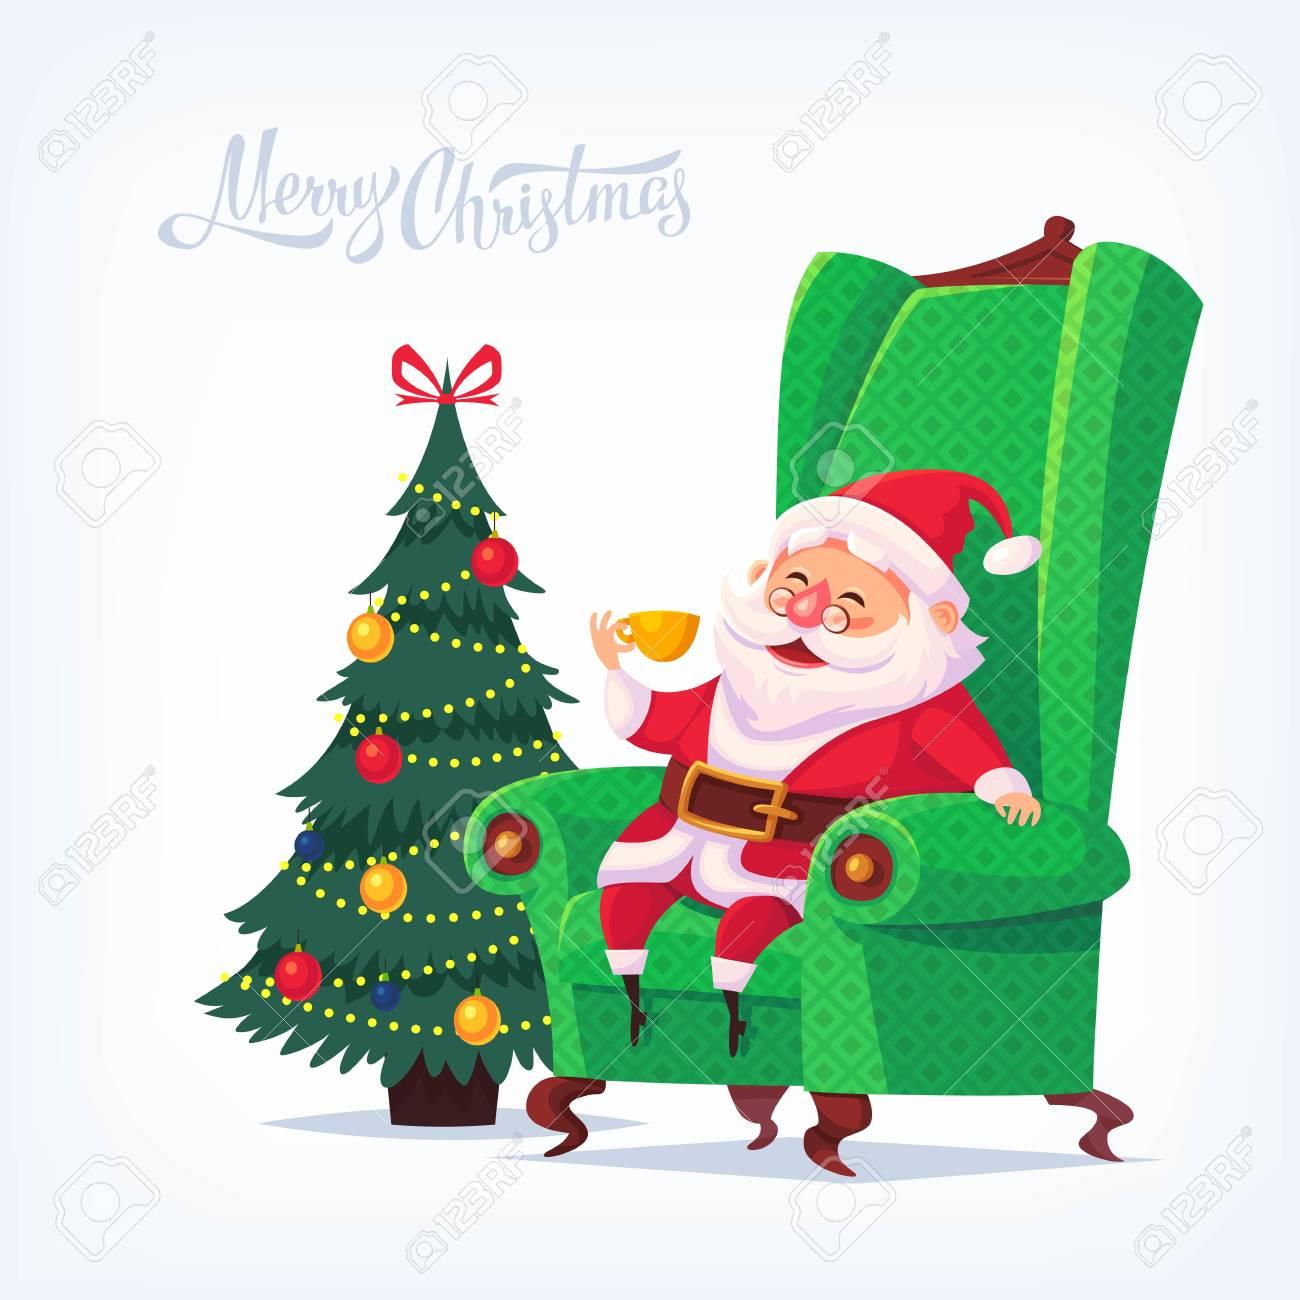 Christmas Vectors.Santa Claus Merry Christmas Vector Cartoon Illustration